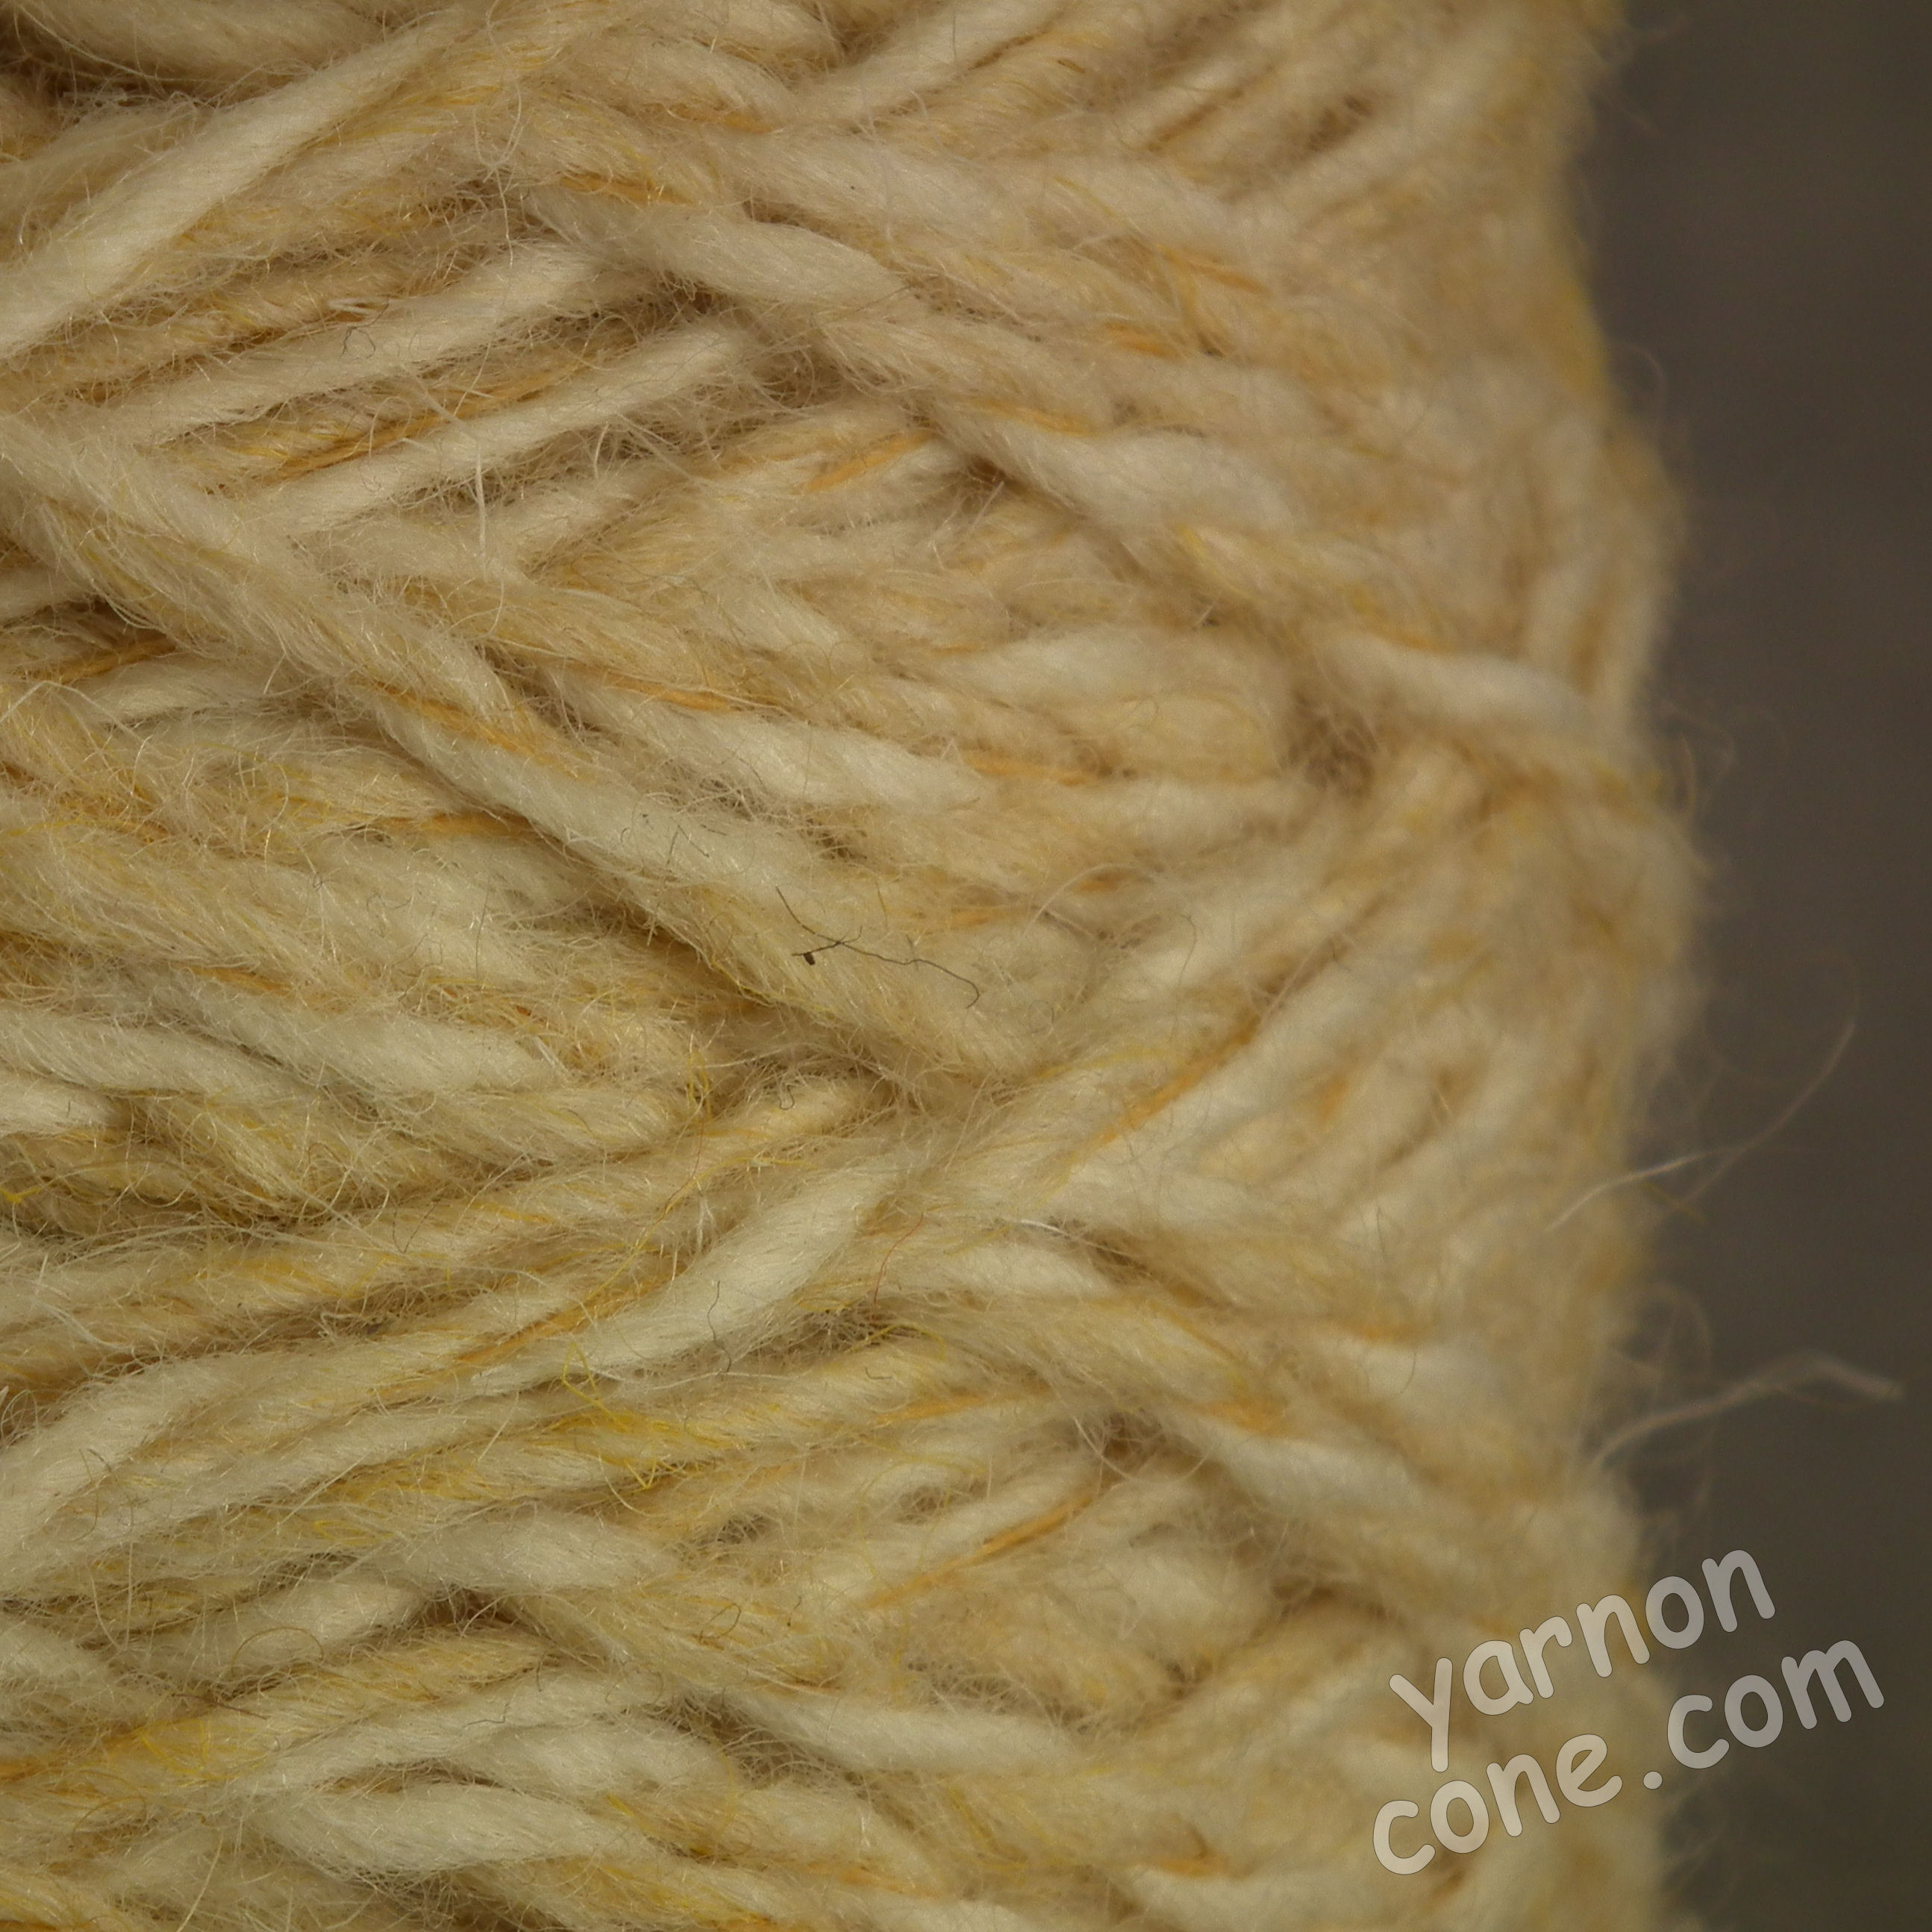 Berber rug making thick carpet yarn weaving latch hook ecru sand BB10 thick wool cone